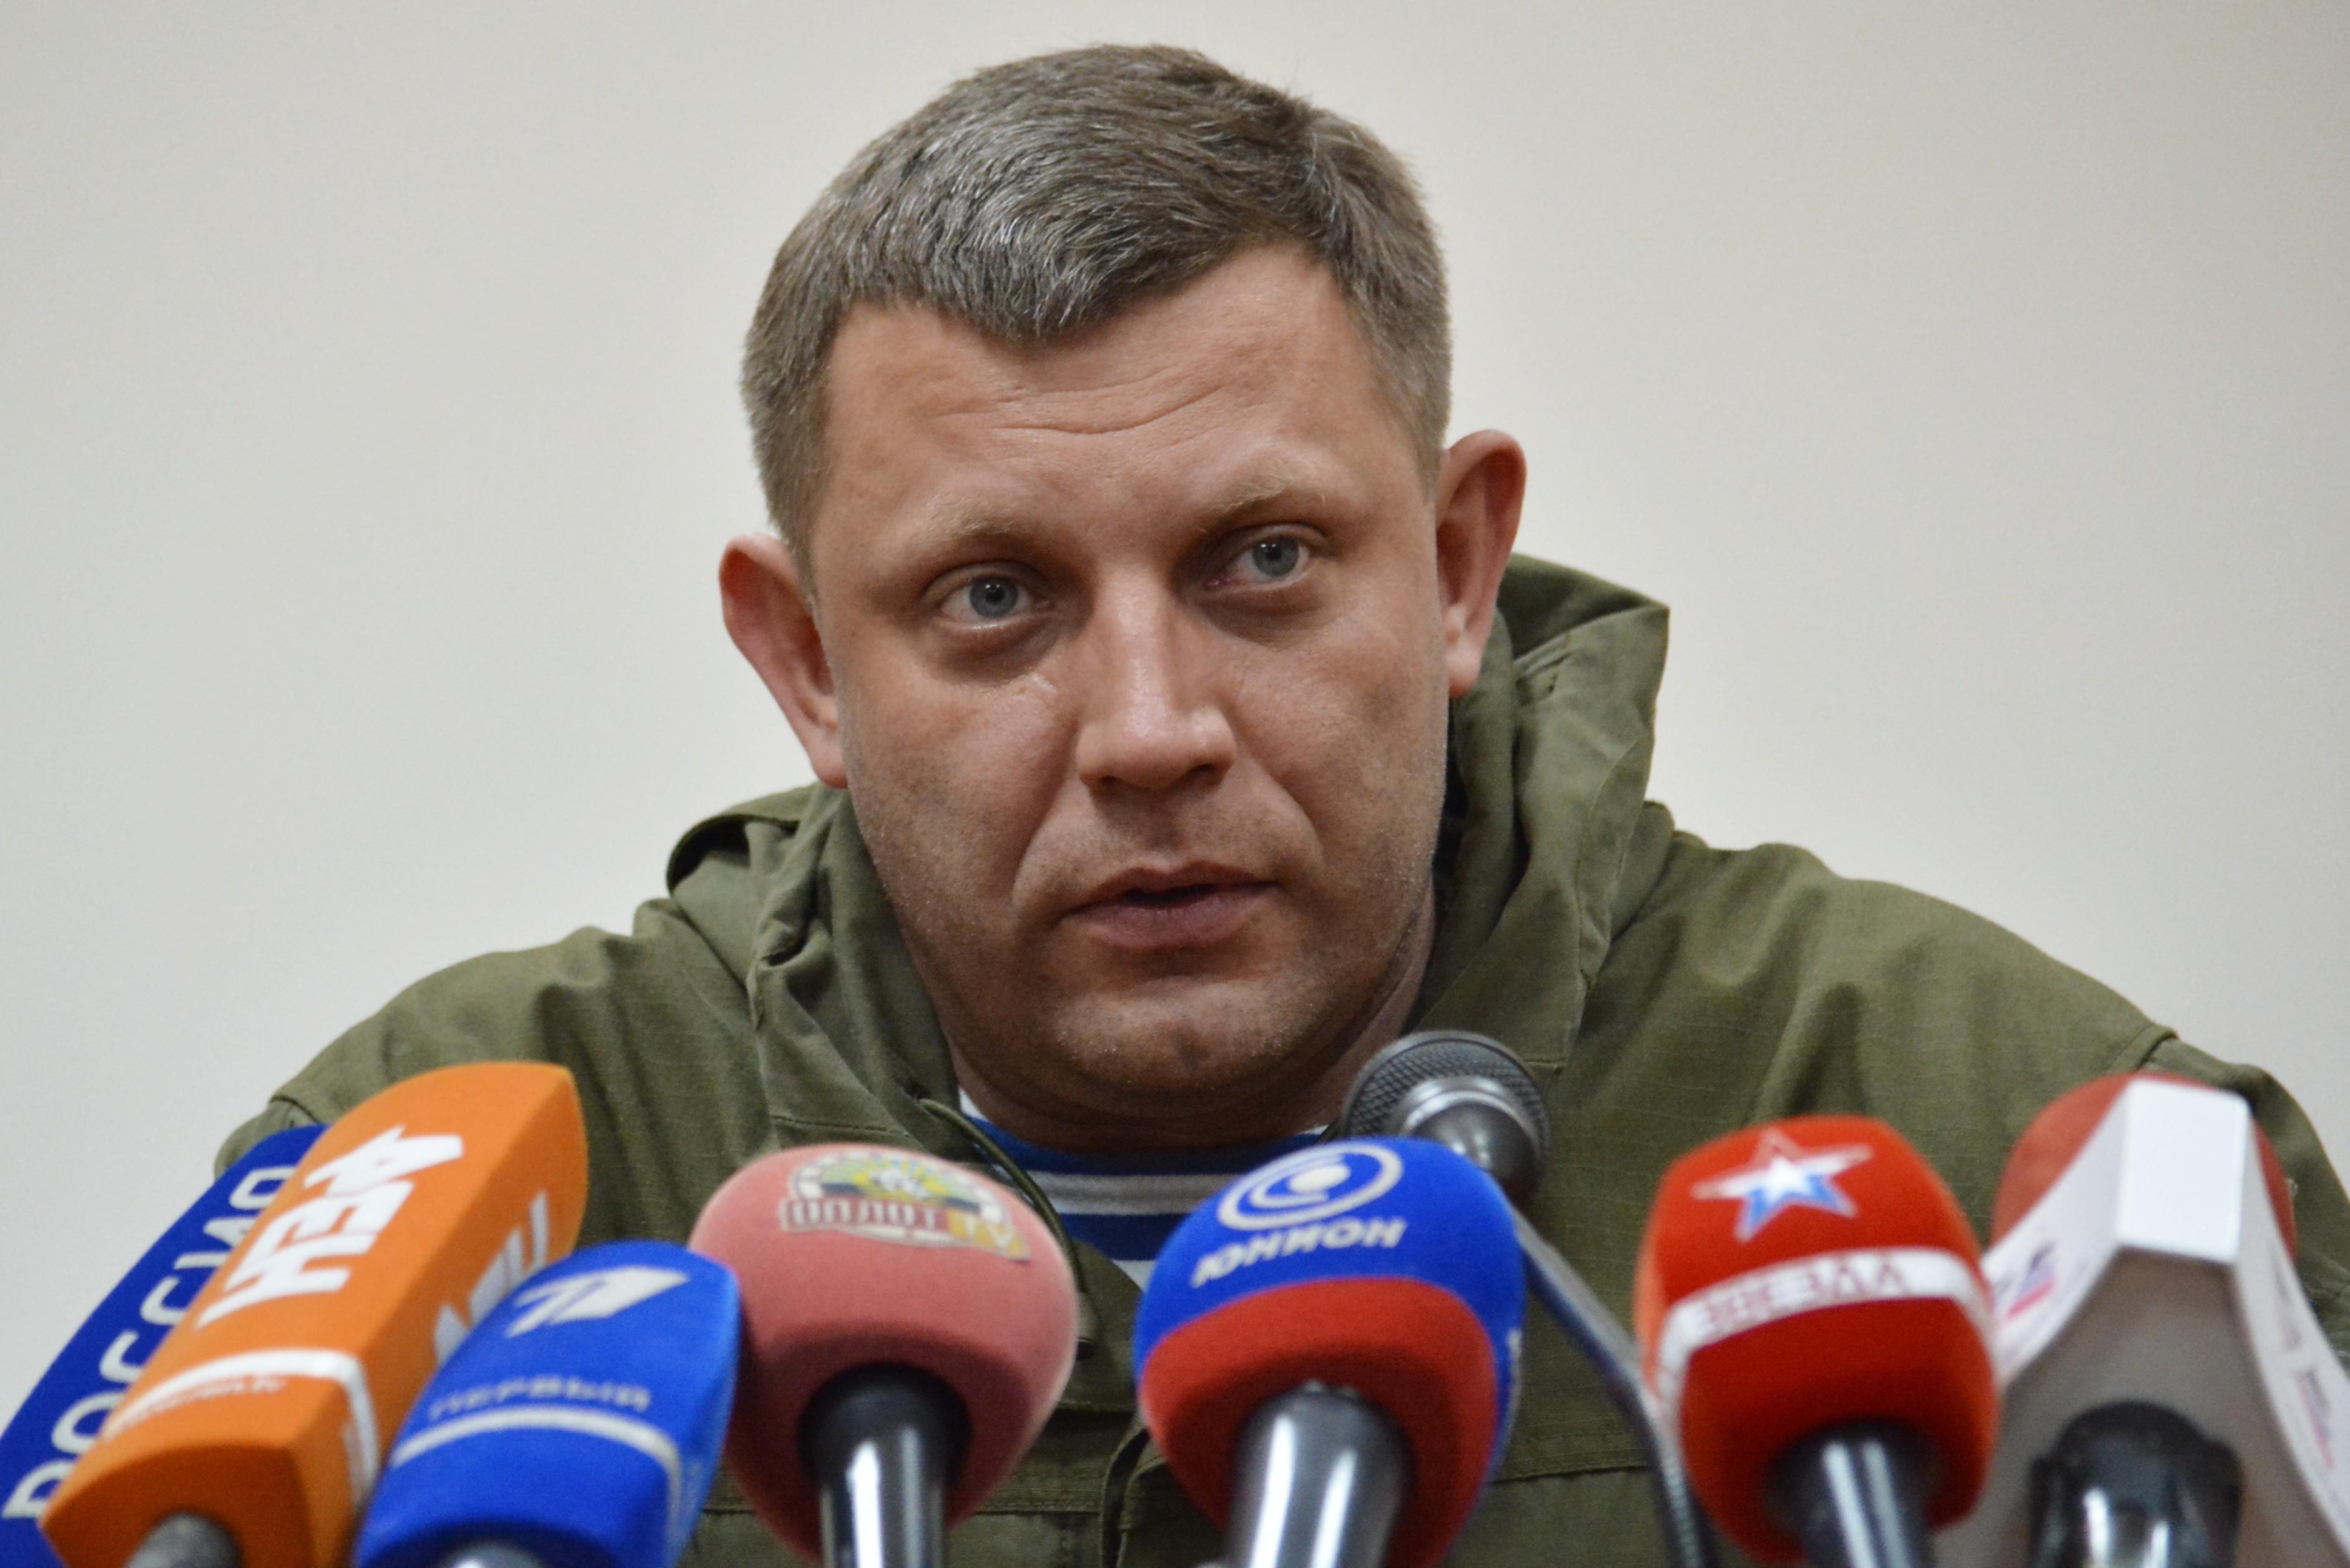 <p>Фото: Пресс-служба А. Захарченко</p>